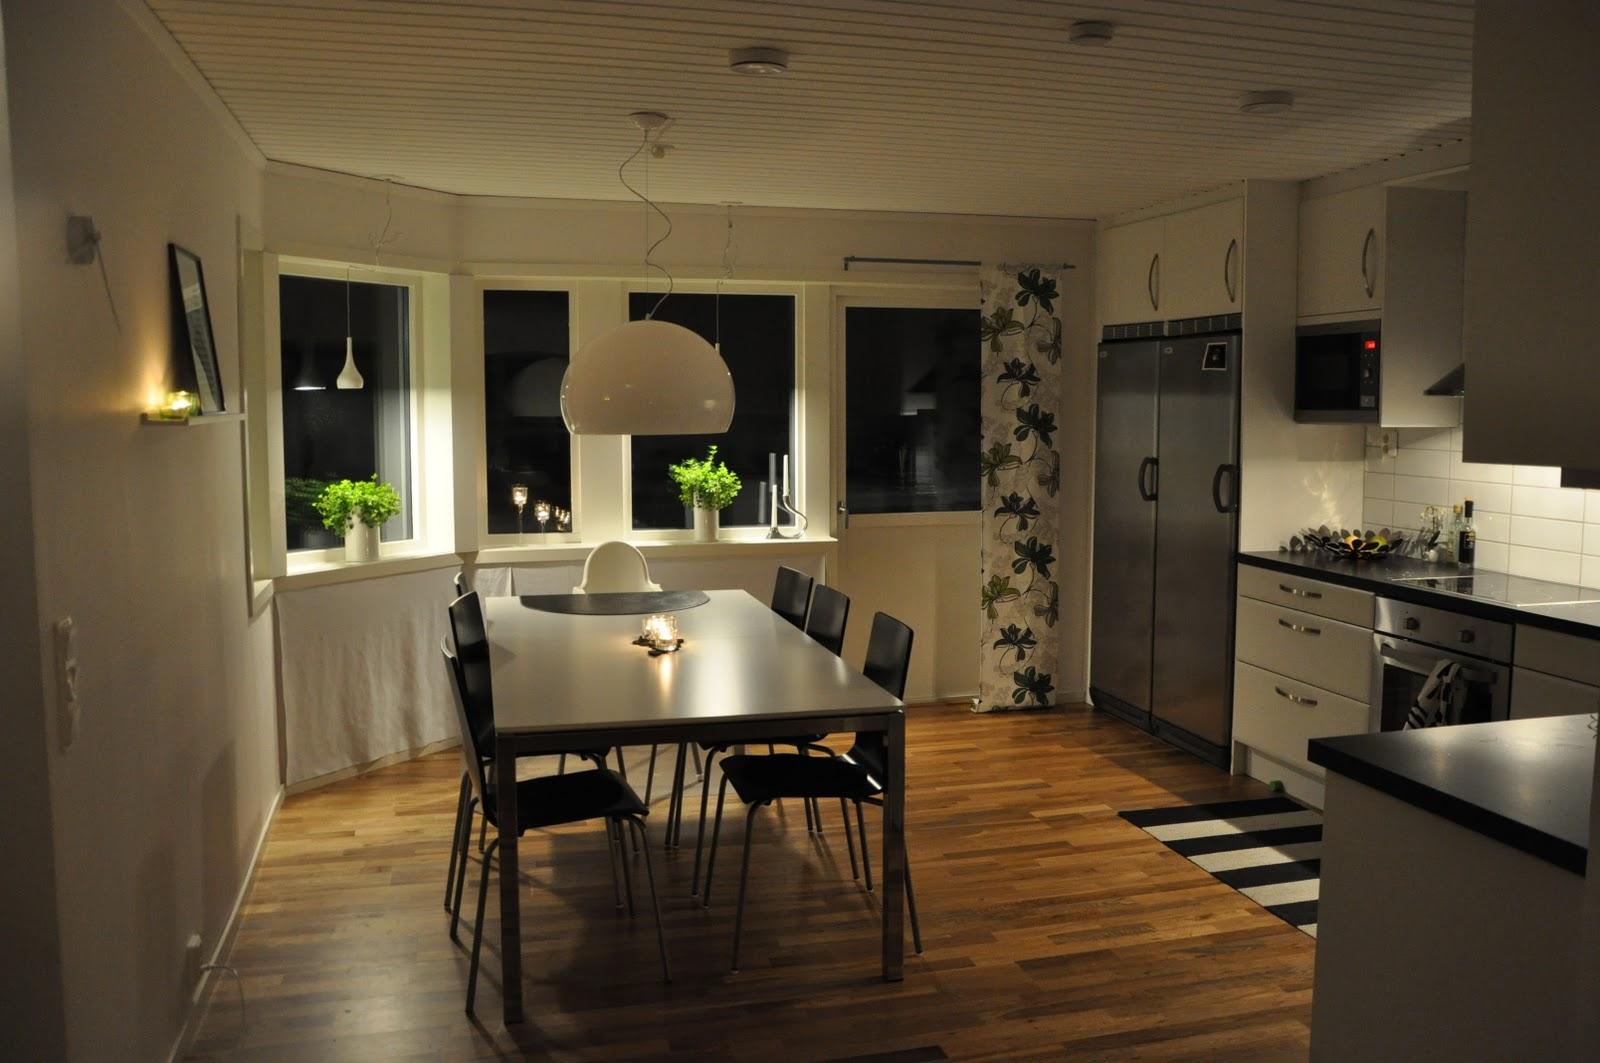 gardiner sichtschutz interi rinspiration och id er f r hemdesign. Black Bedroom Furniture Sets. Home Design Ideas